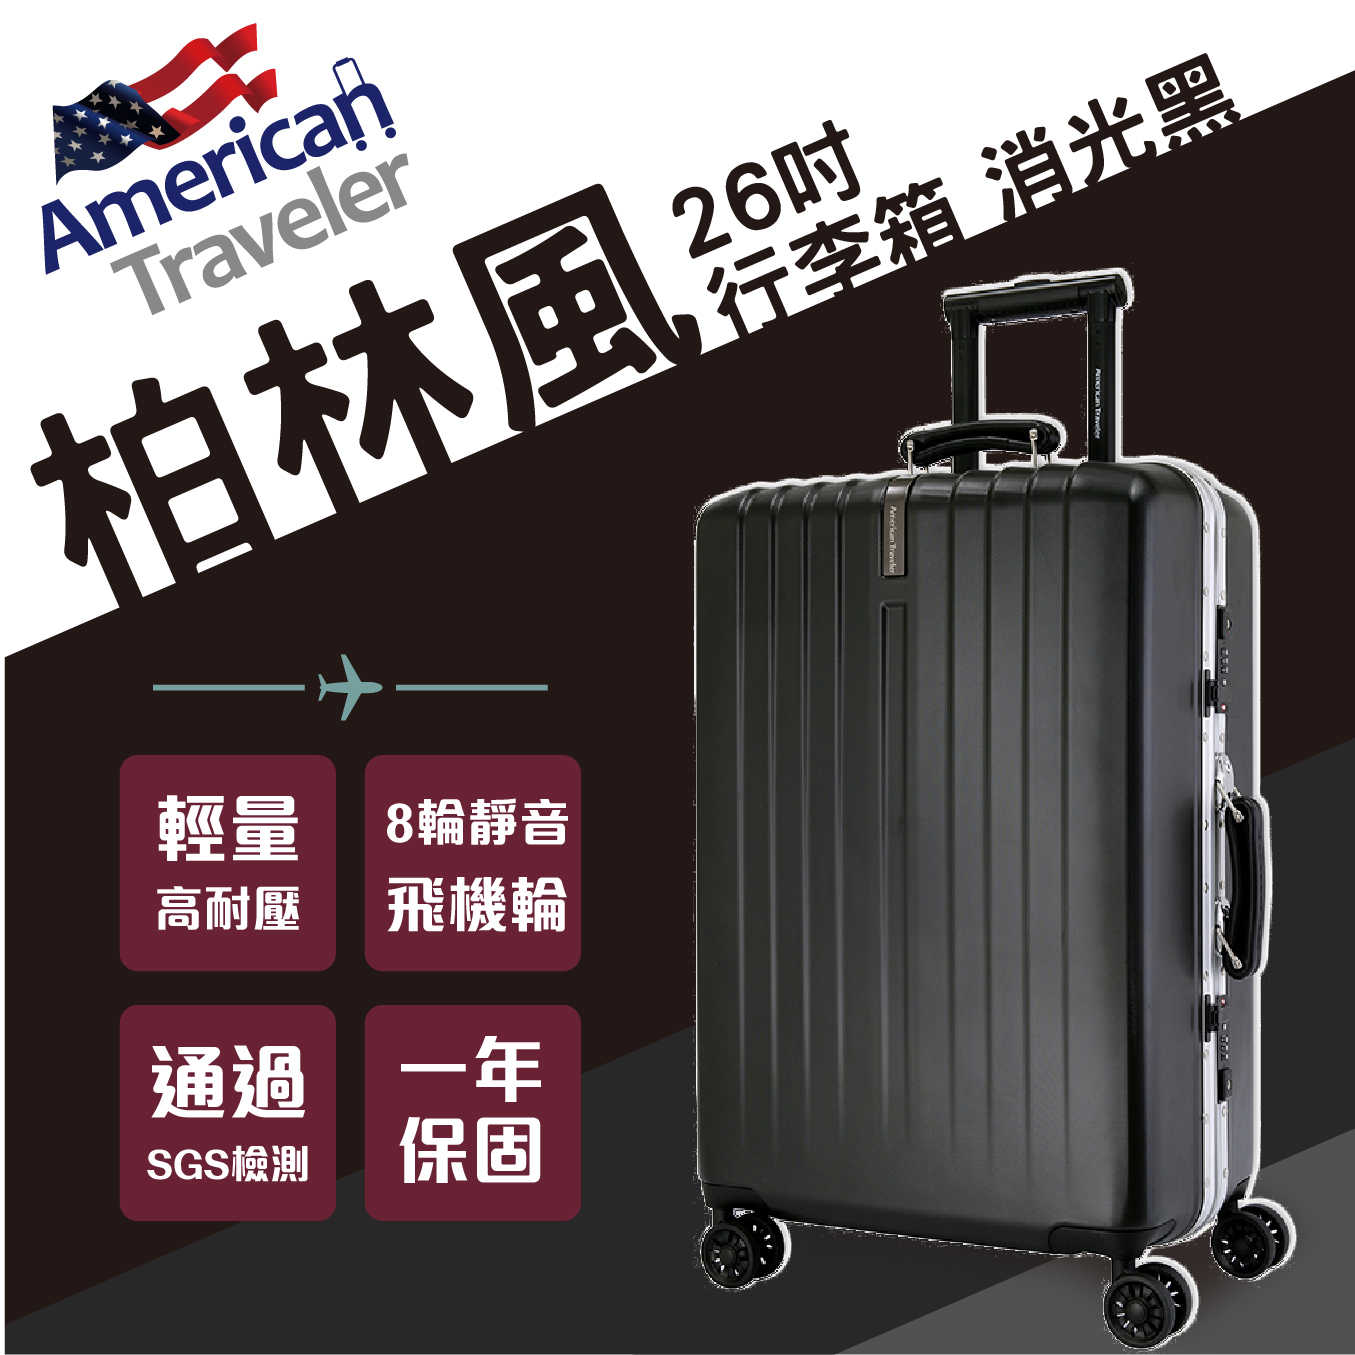 [American Traveler] BER 柏林系列 – 26吋耐衝擊超輕大容量鋁框行李箱-黑